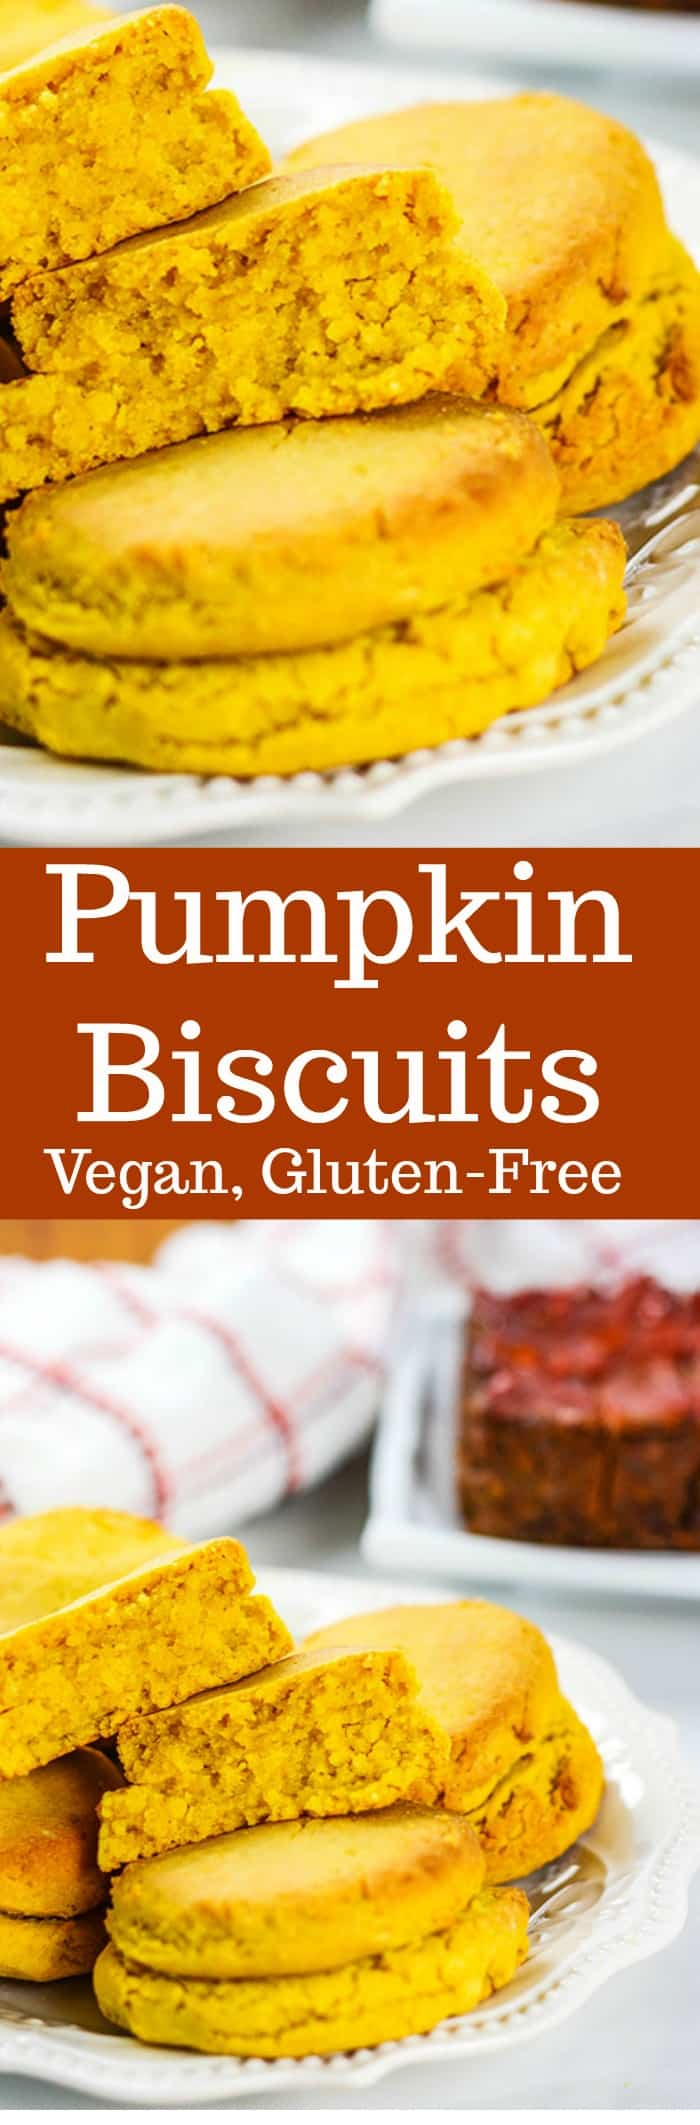 Pumpkin Biscuits (Vegan, Gluten-Free)